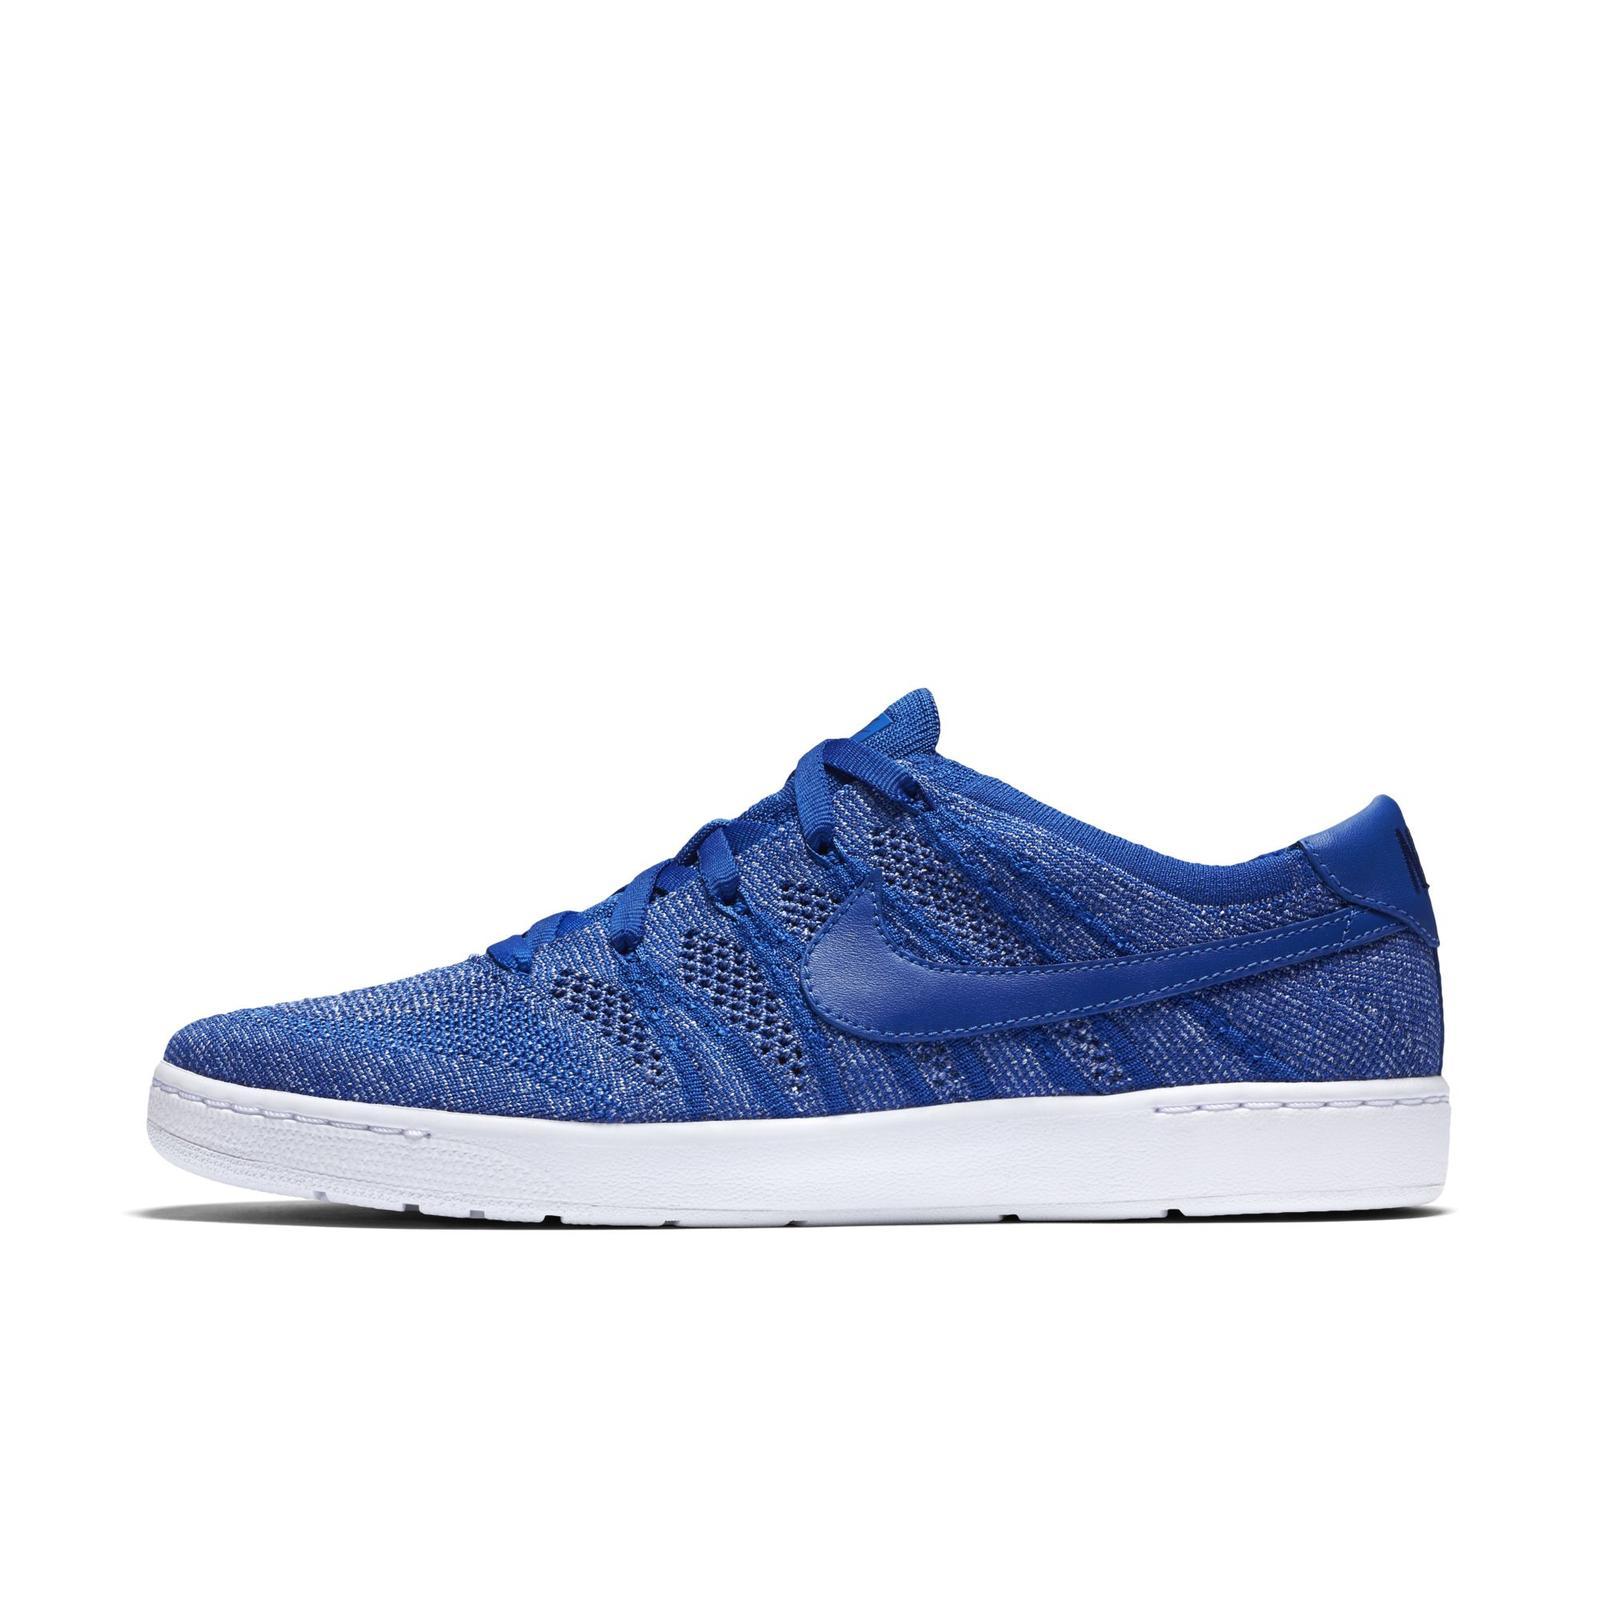 Nike Tennis Classic Ultra Flyknit Running Shoes